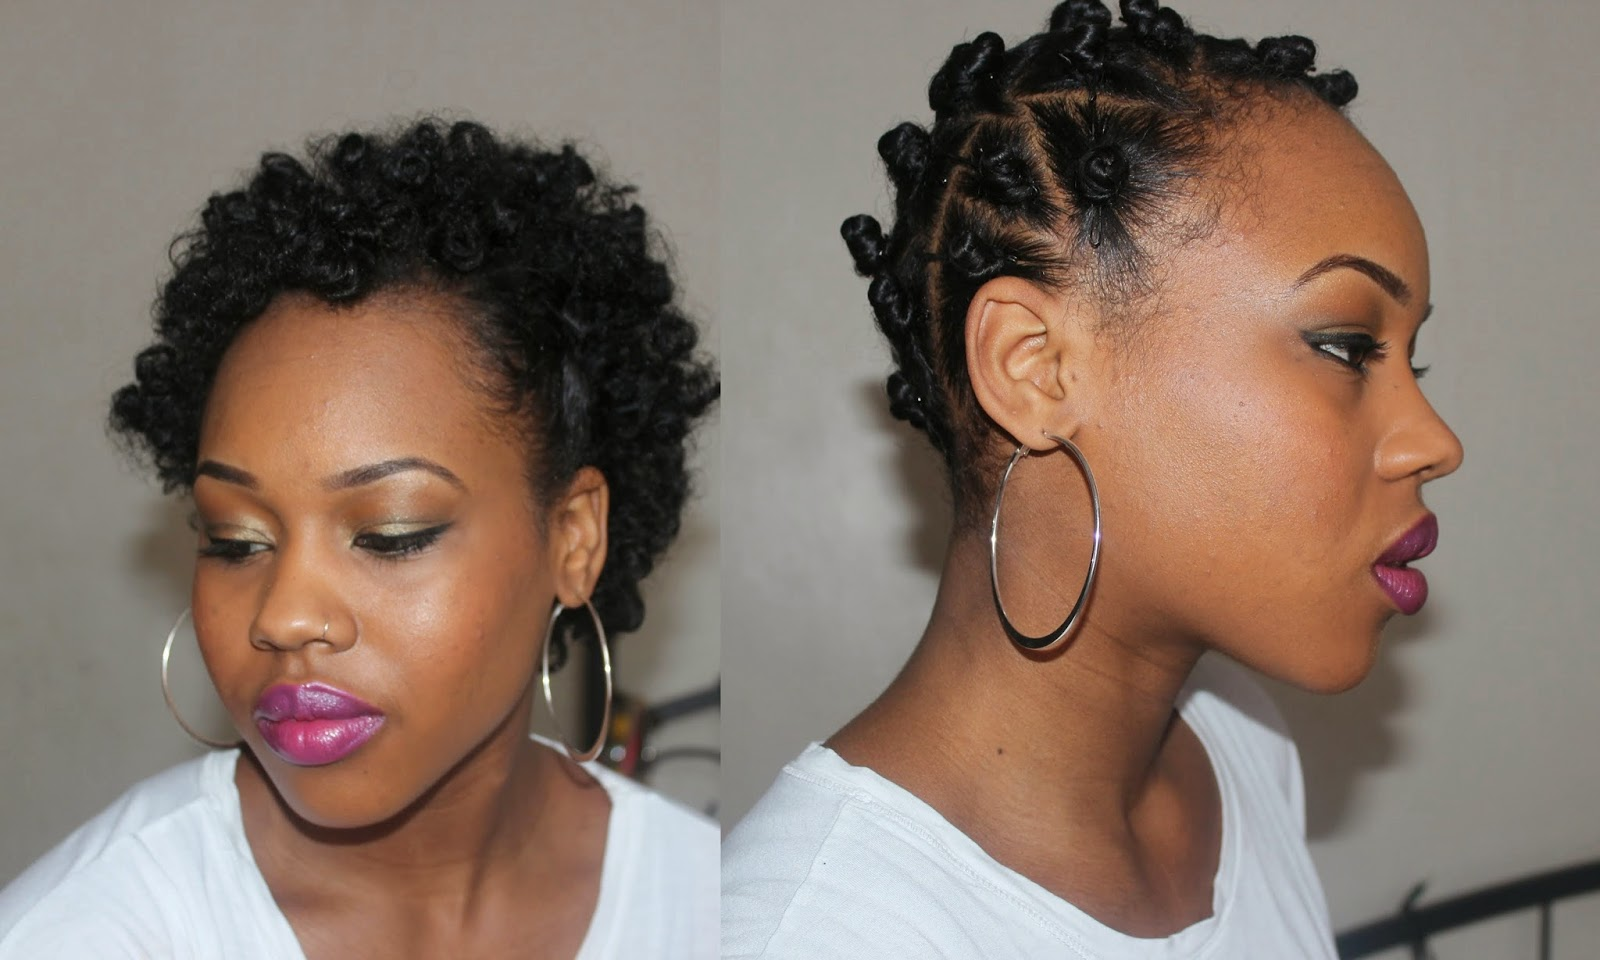 Bantu Knots On Natural Hair Moisturizer